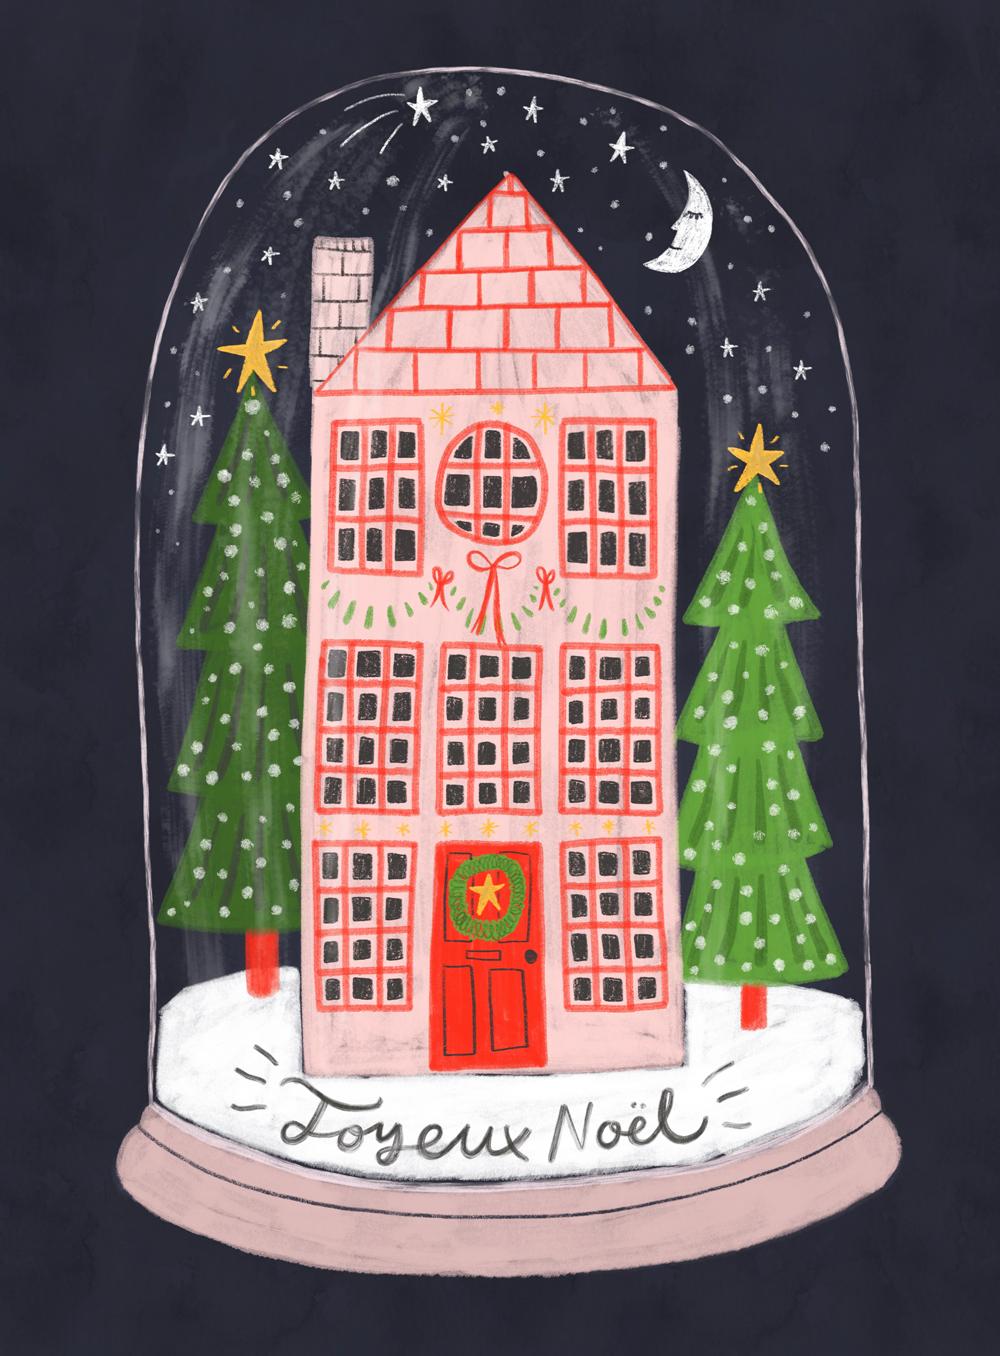 Joyeux Noël Snow Globe · Lee Foster-Wilson